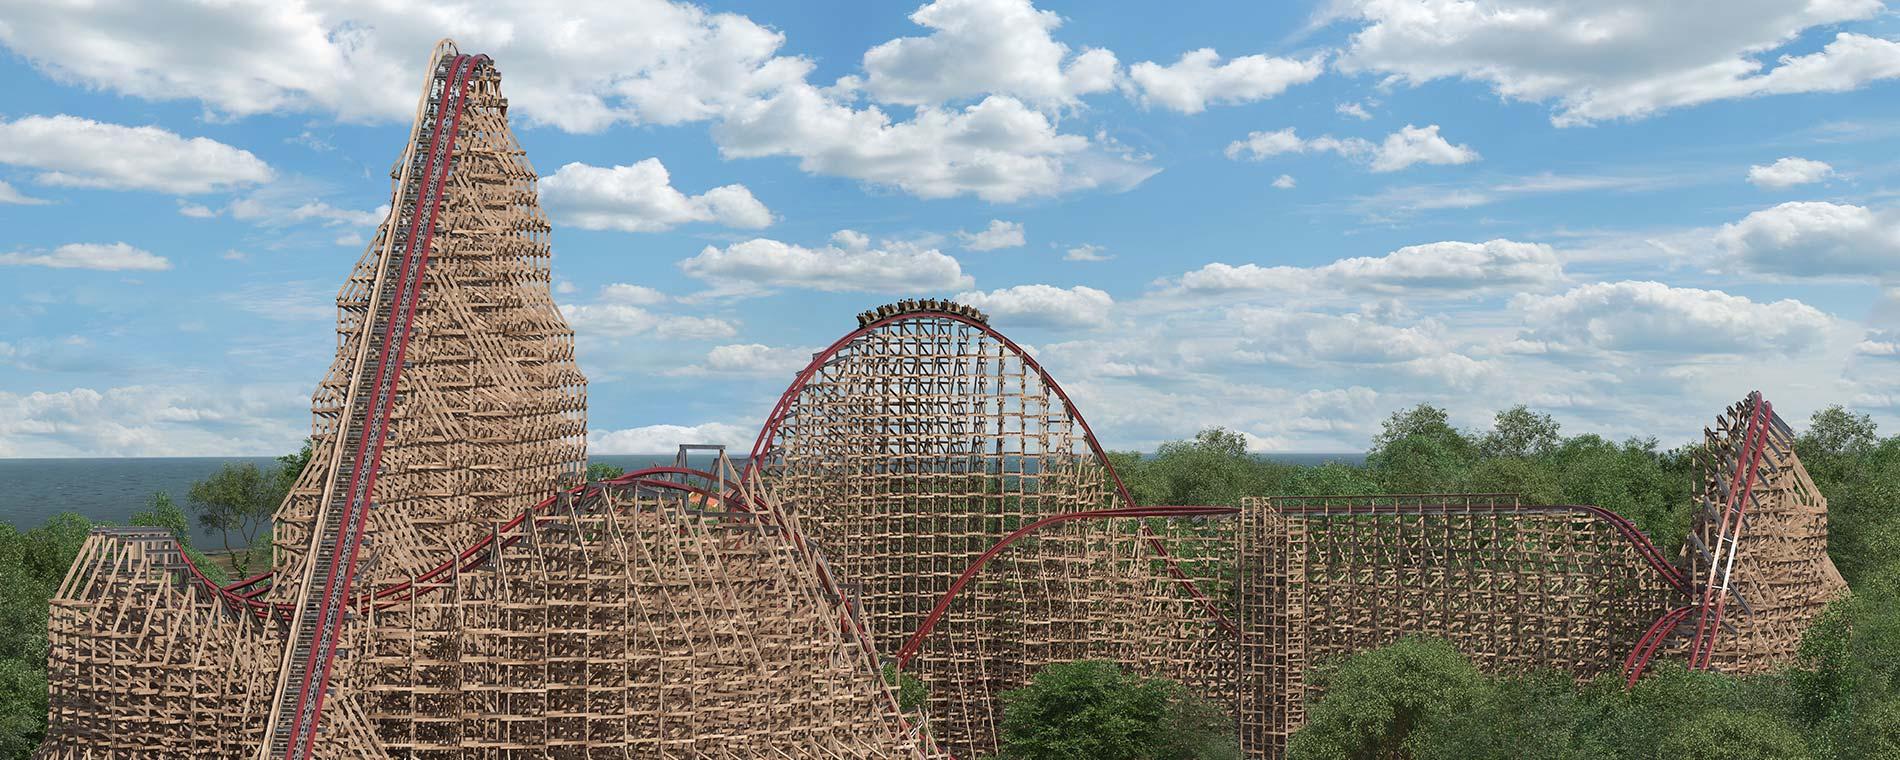 Cedar Point Announces Record Breaking Steel Vengeance For 2018